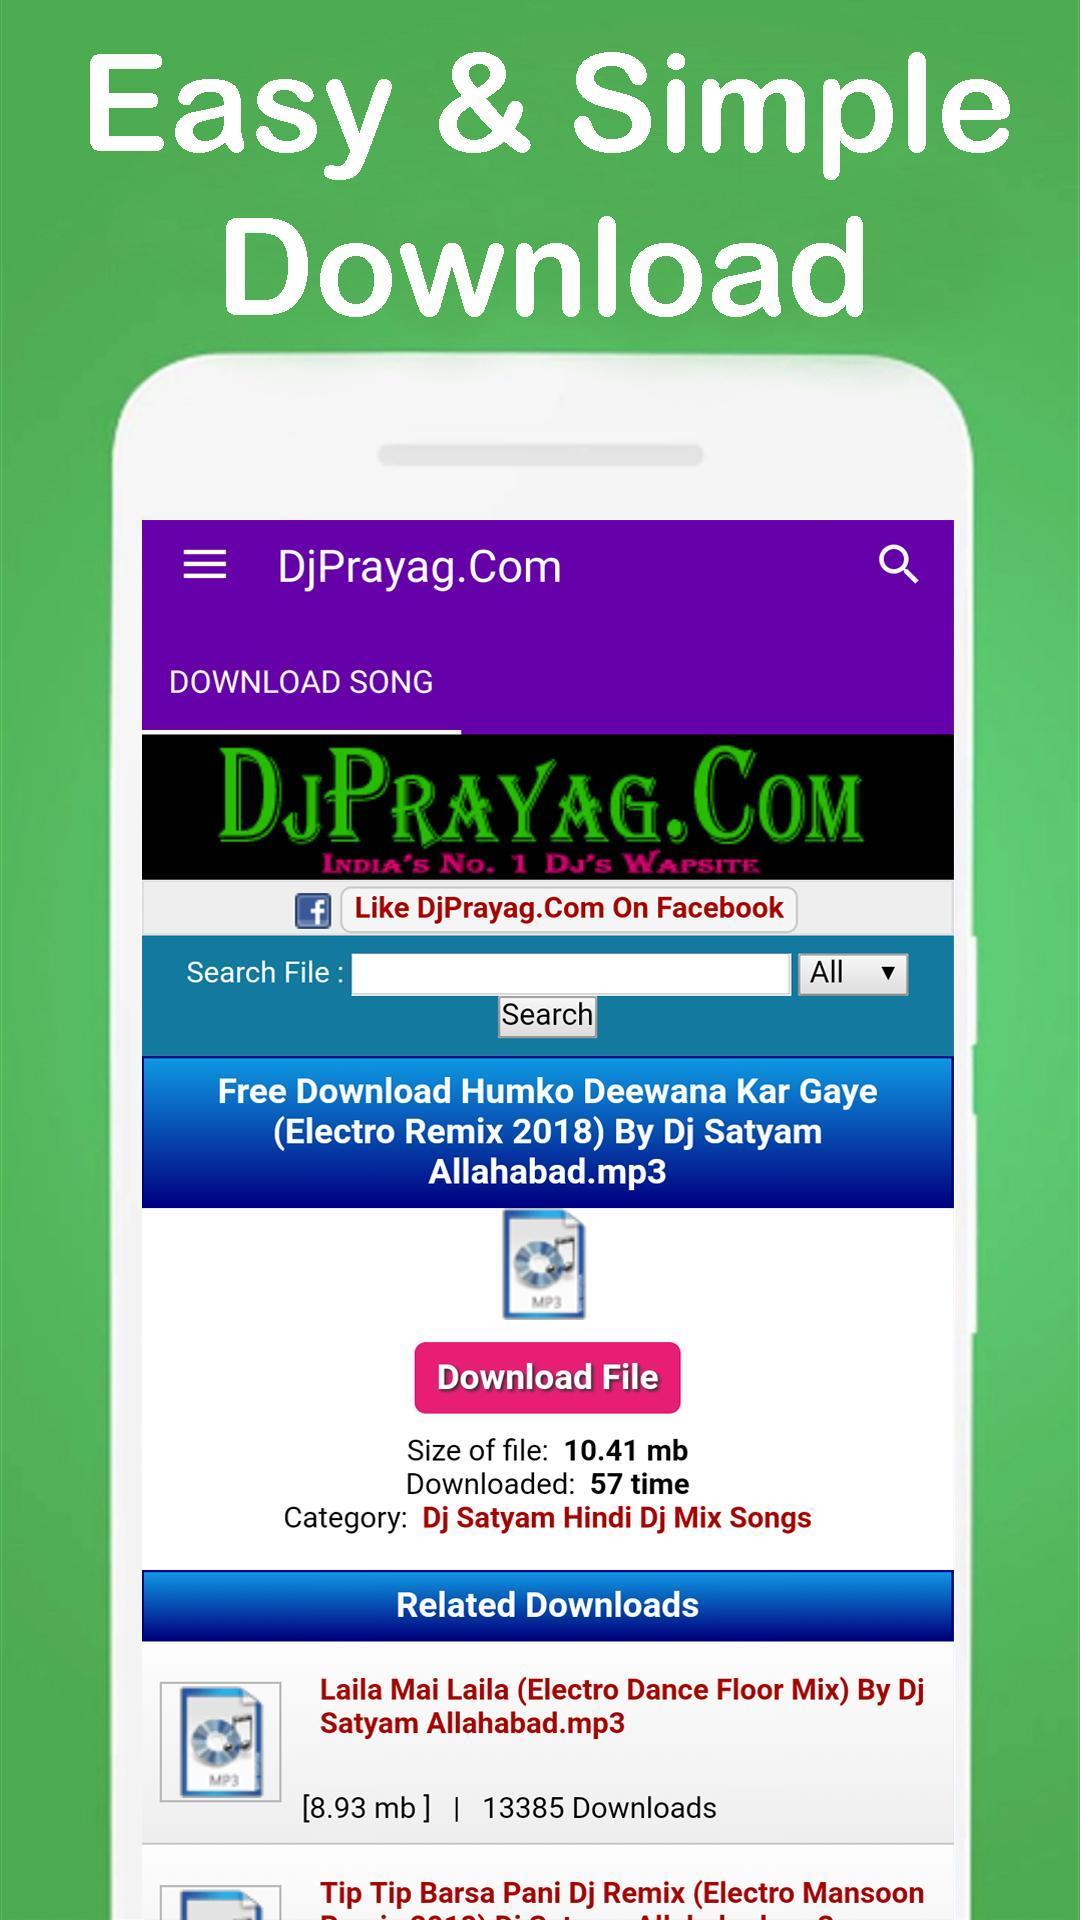 Dj Prayag - Bhojpuri Dj Remix Song for Android - APK Download